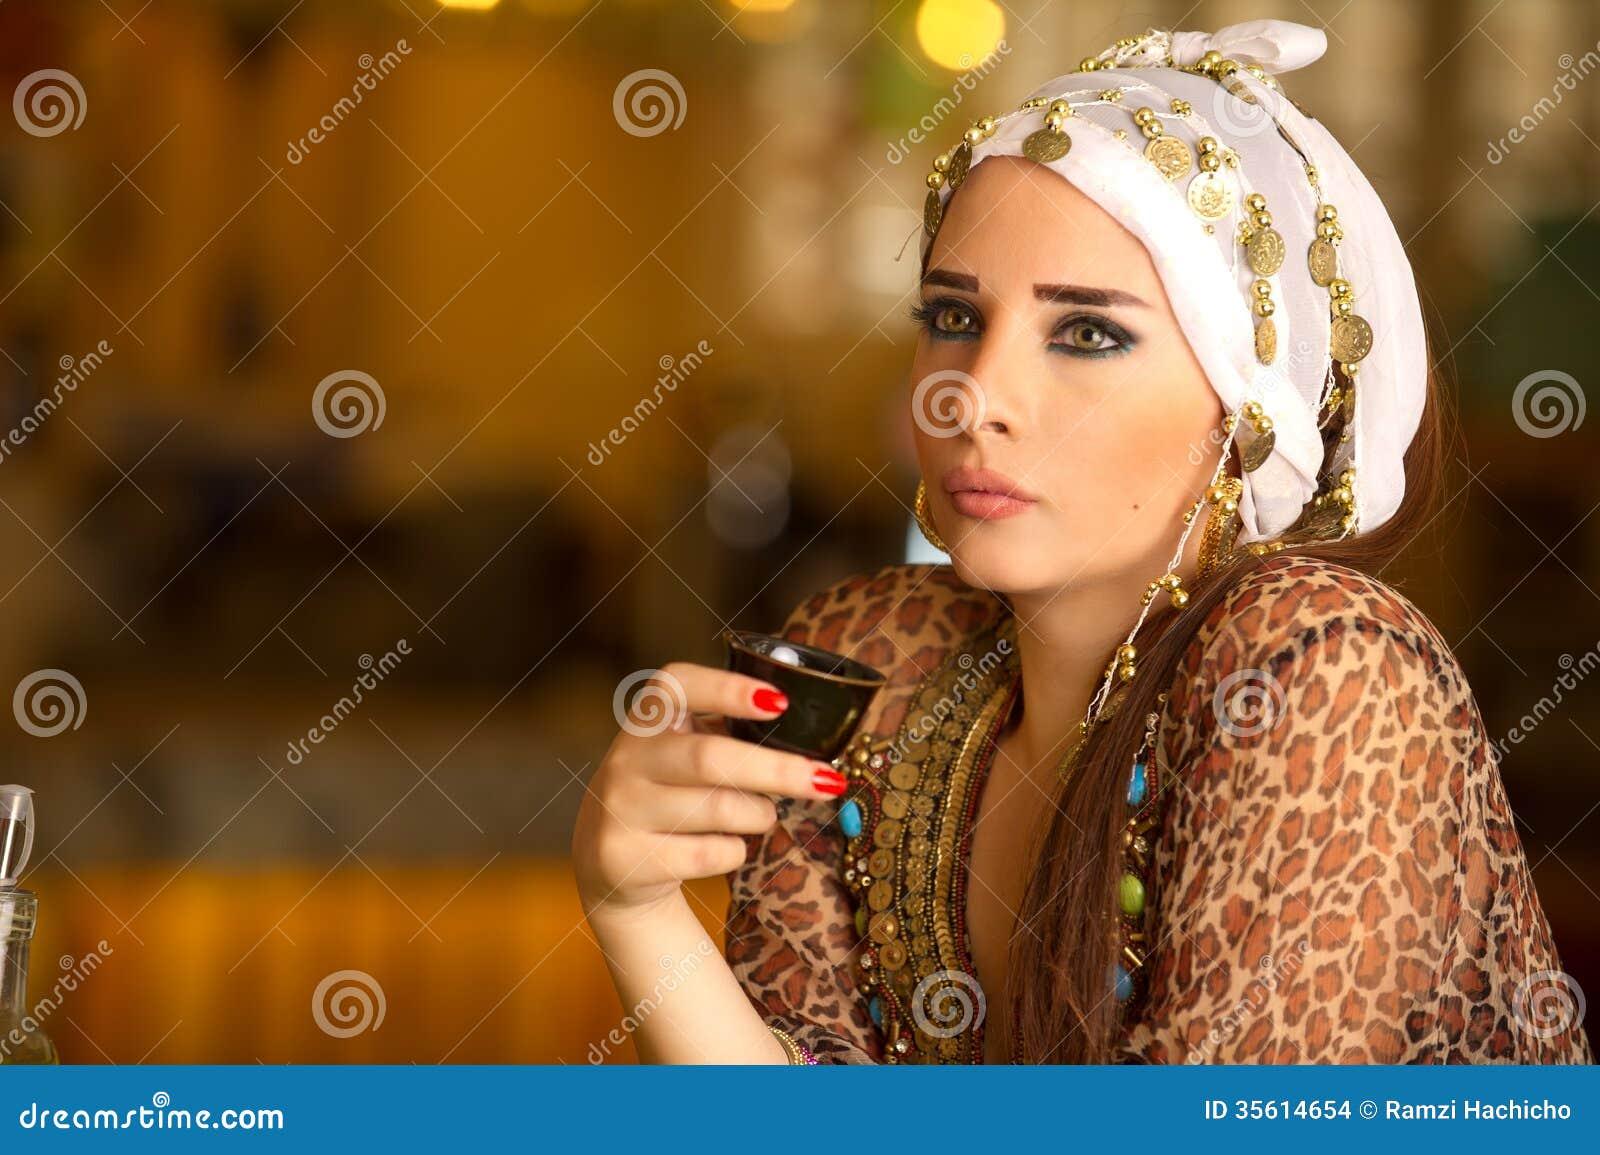 Arab Dating Chat Rooms Women Men Muslim Dating amp Chat